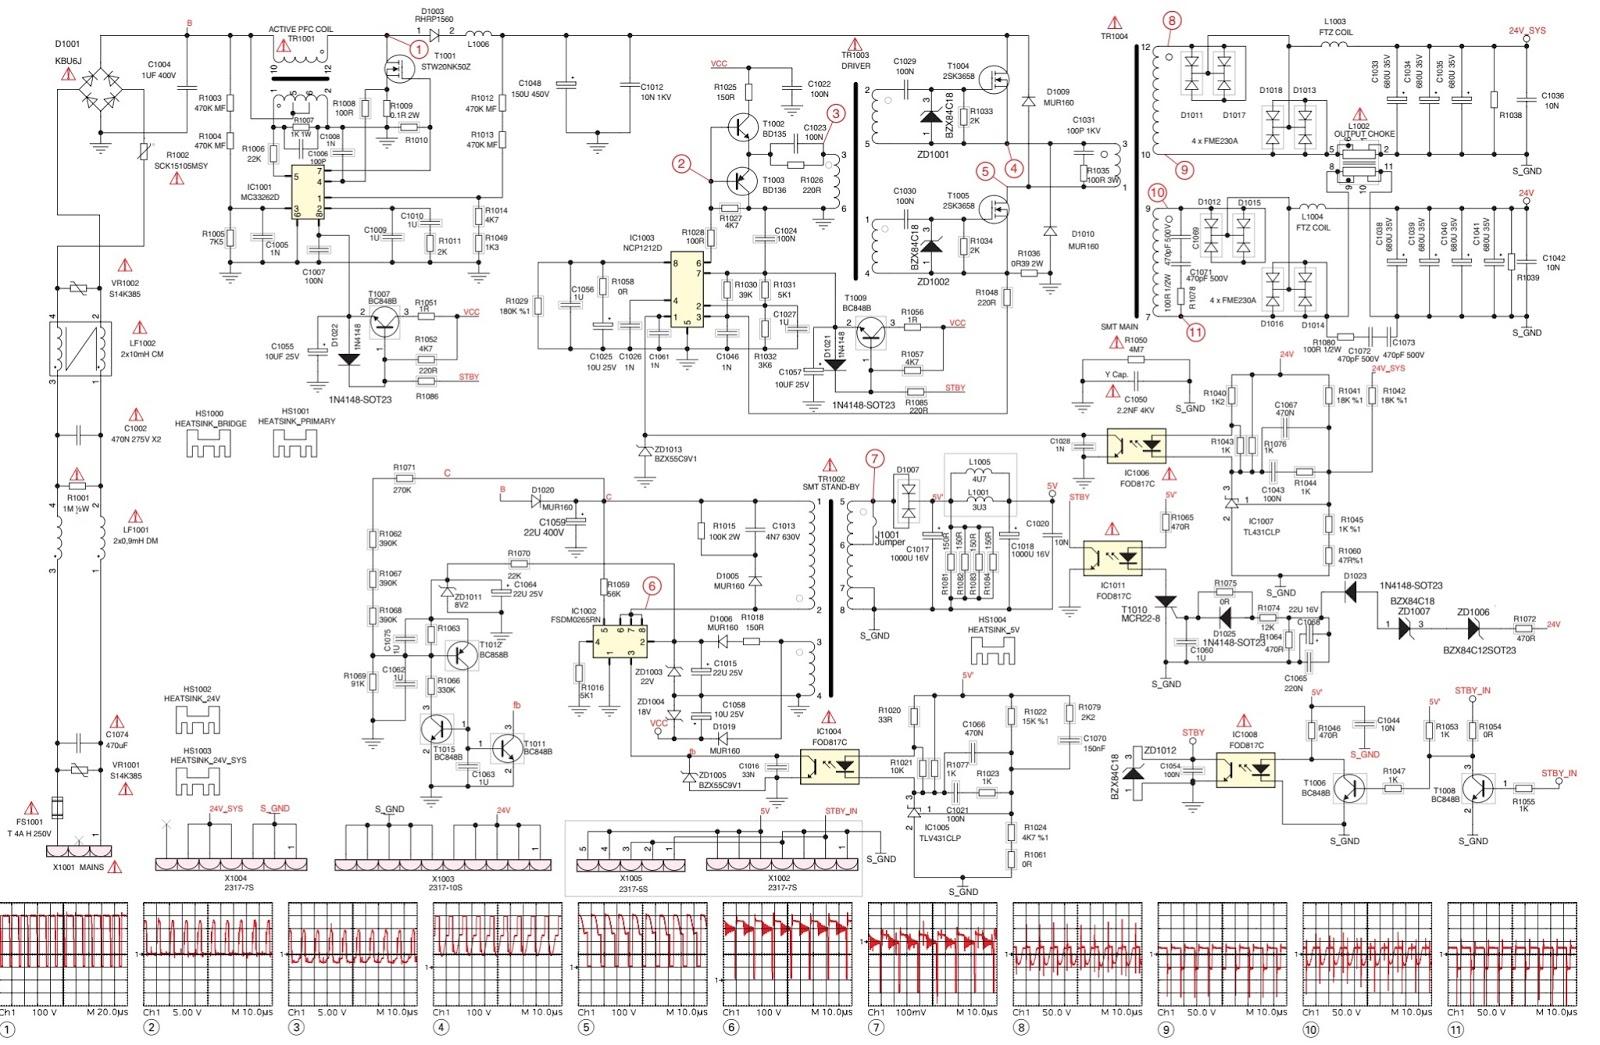 small resolution of power supply board zz7194 11 mc33262d ncp1212d fsdm0265rn fod817c opto